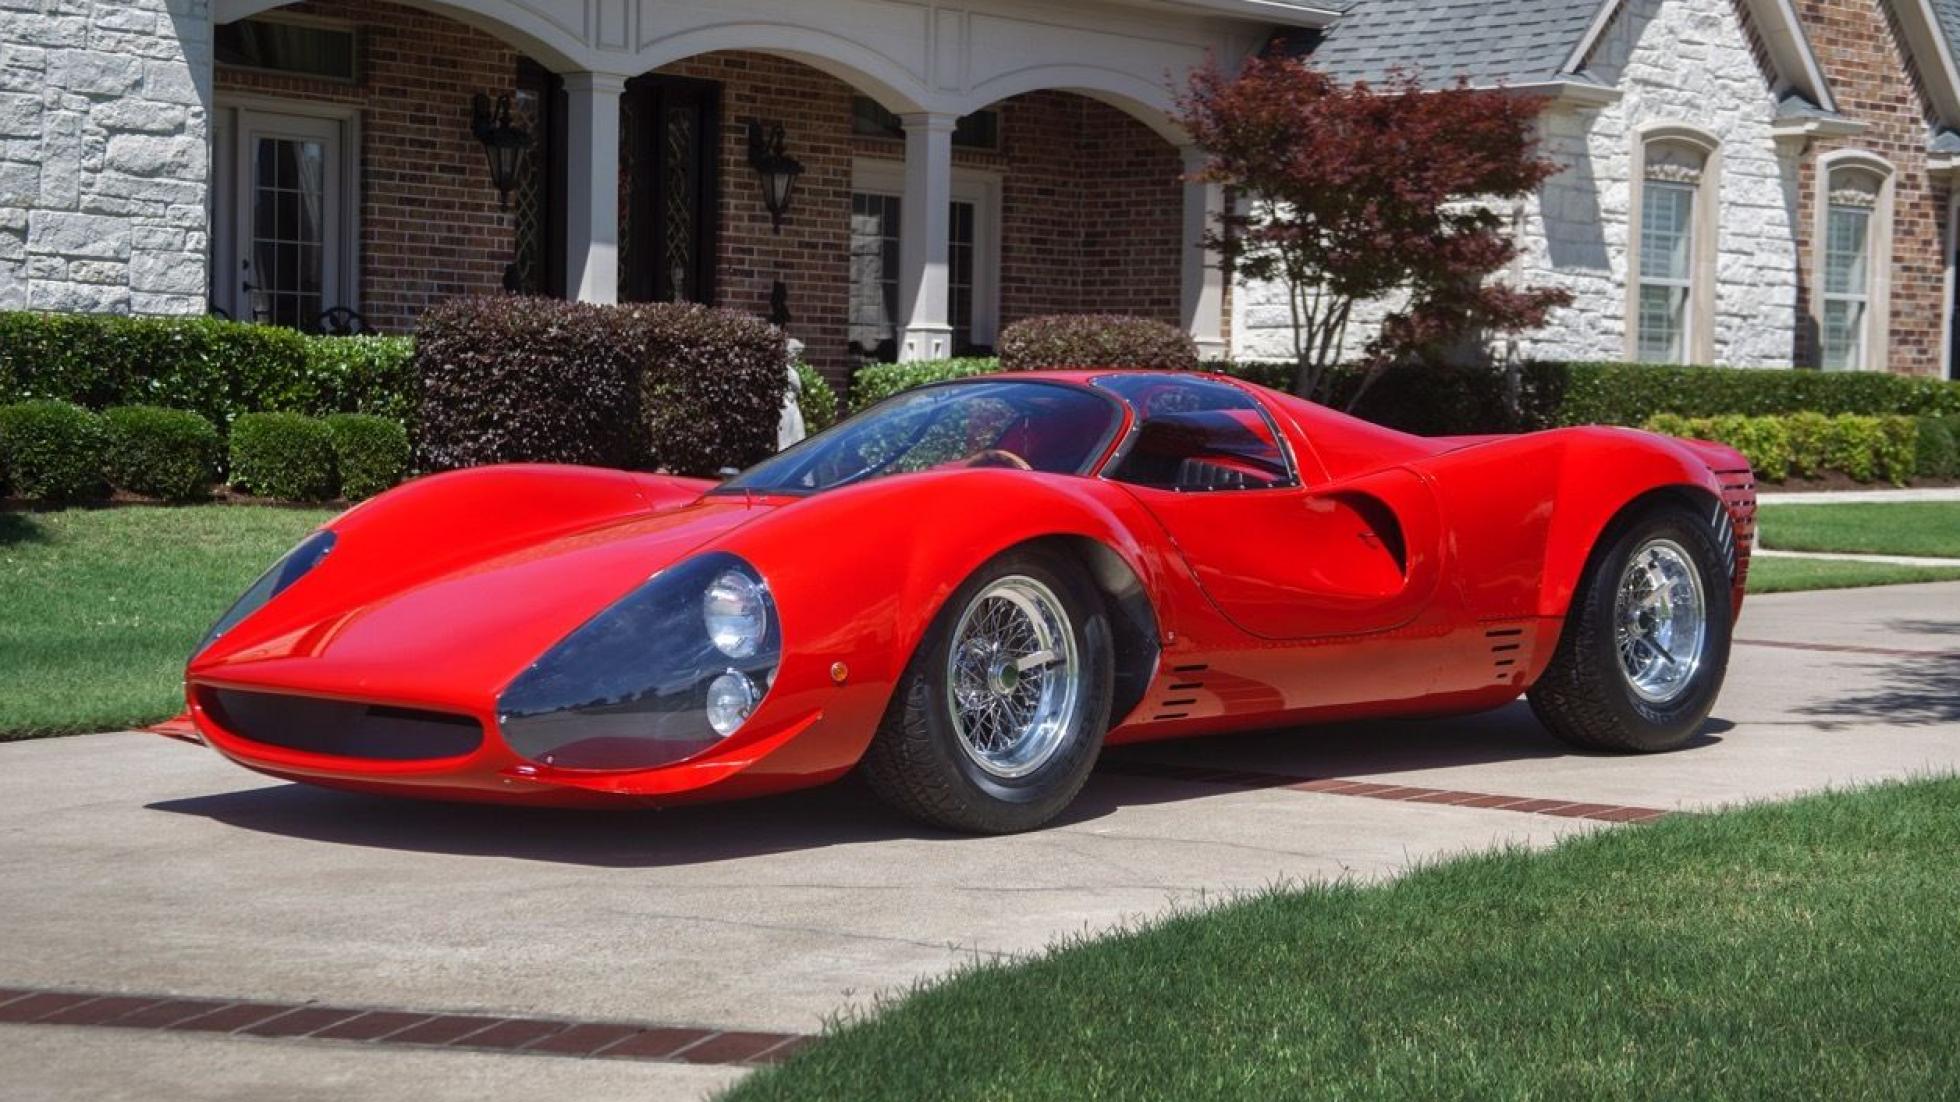 434131df2c7528a15a01d0b246fb35df Outstanding Ferrari Mondial 8 Sale south Africa Cars Trend